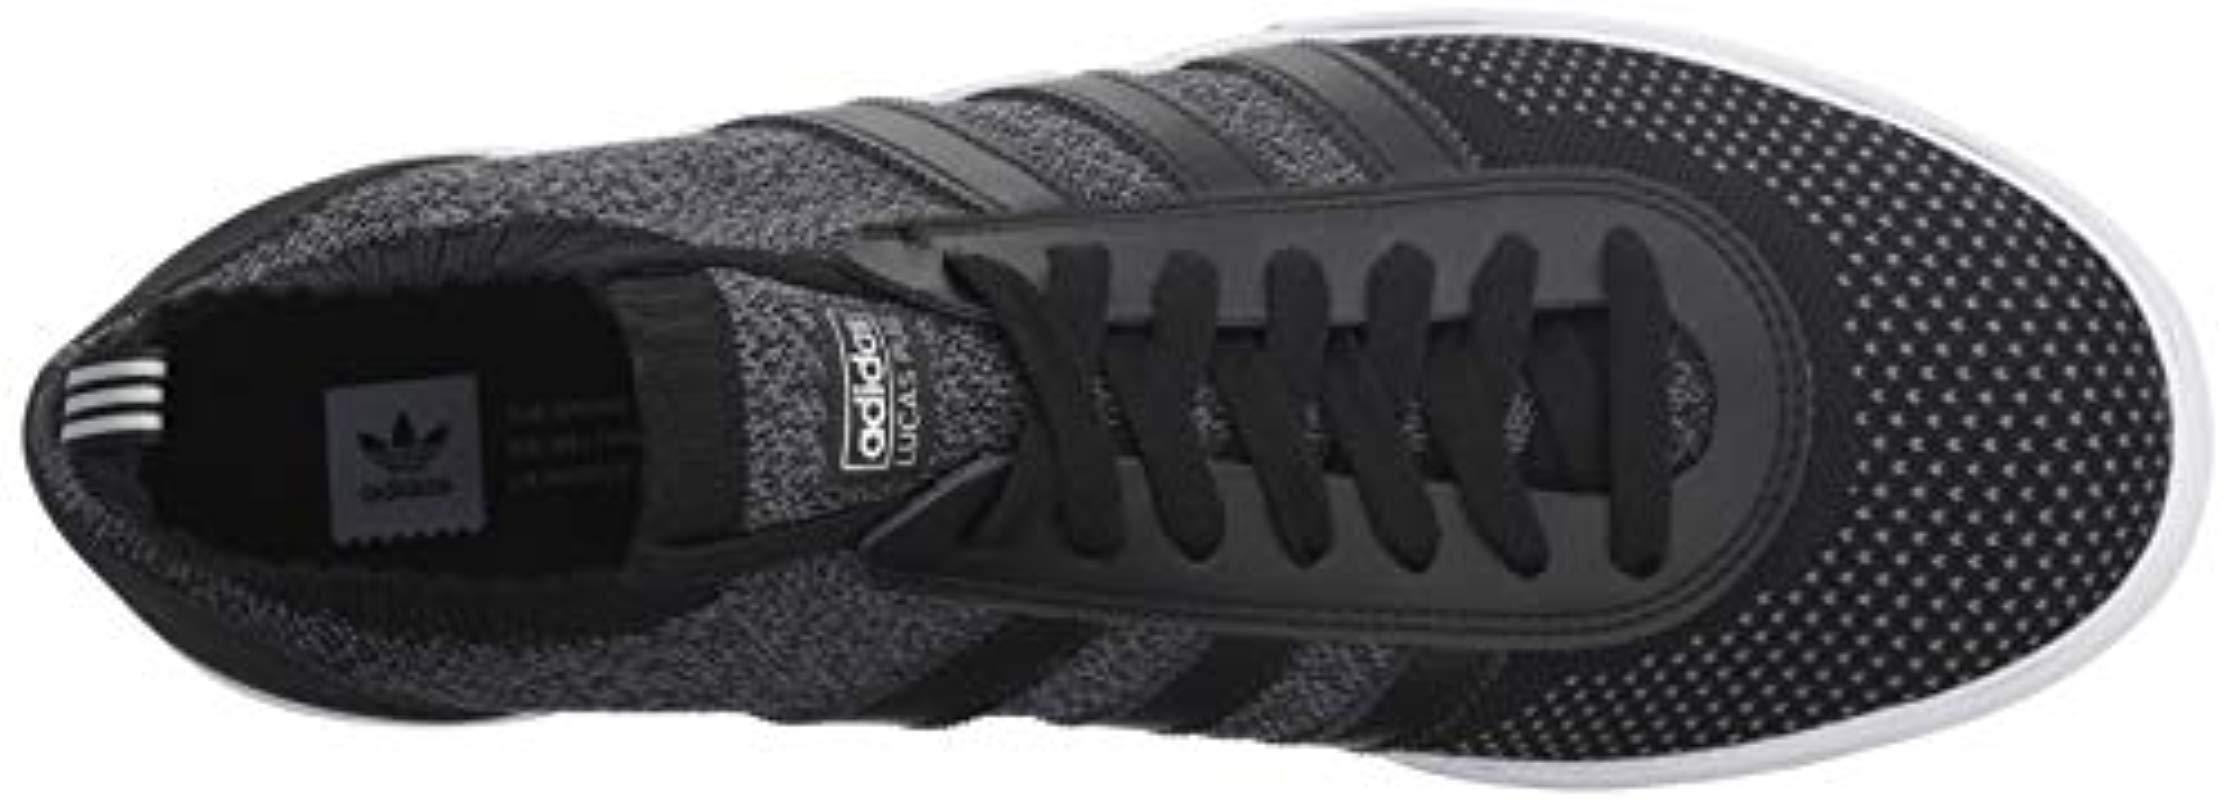 d630725eef5 Adidas Originals - Black Lucas Premiere Pk Running Shoe for Men - Lyst.  View fullscreen